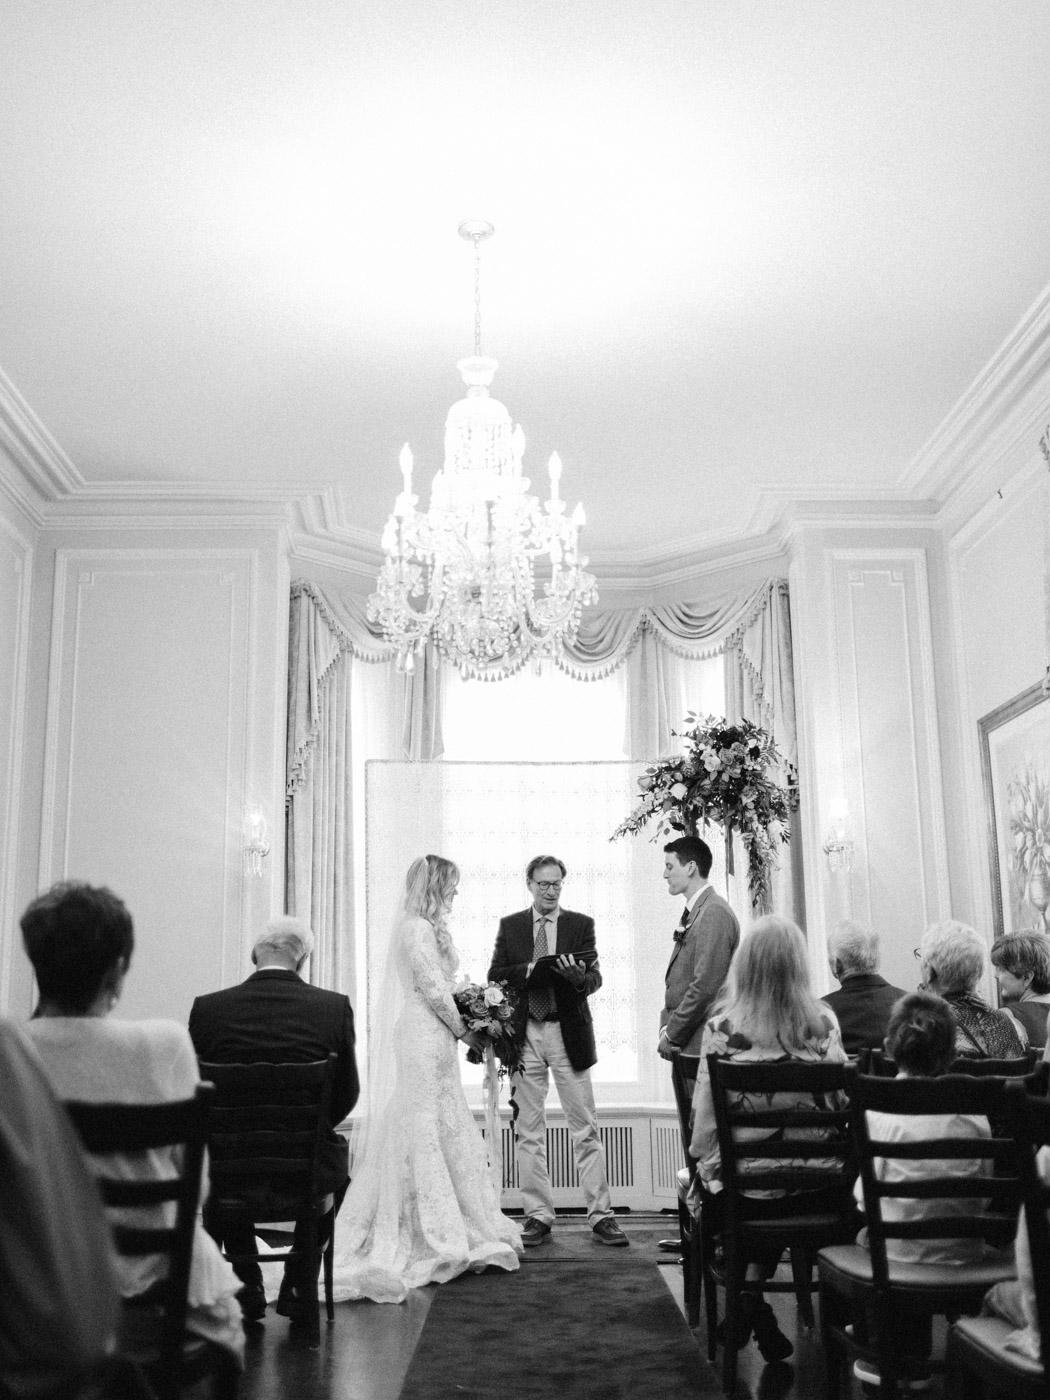 Toronto-wedding-photographer-intimate-classic-fine-art-elopement-ottawa27.jpg